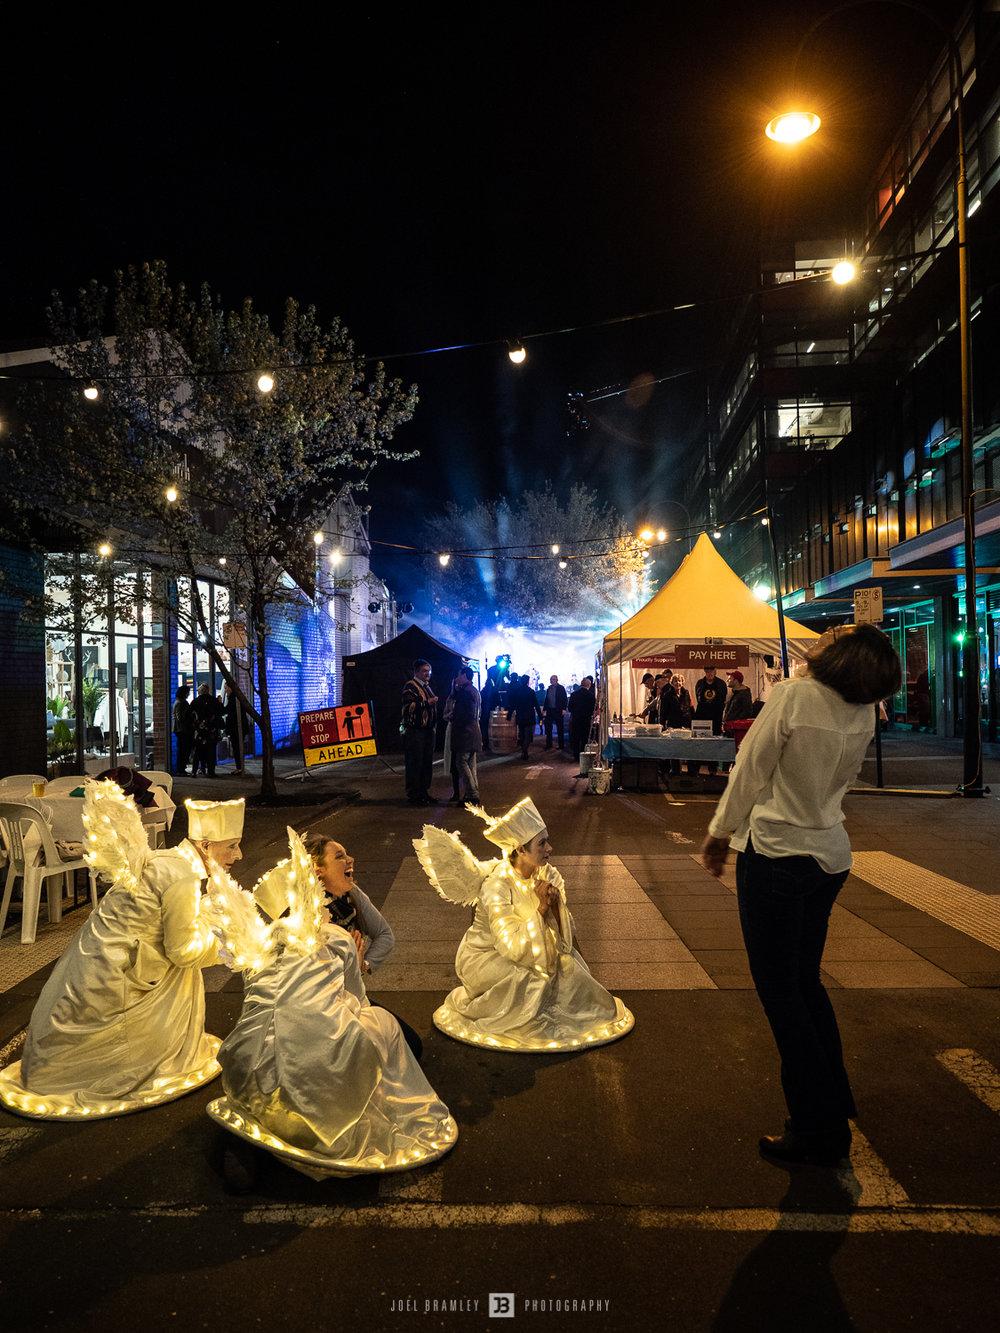 cbnc-street-party-22.jpg